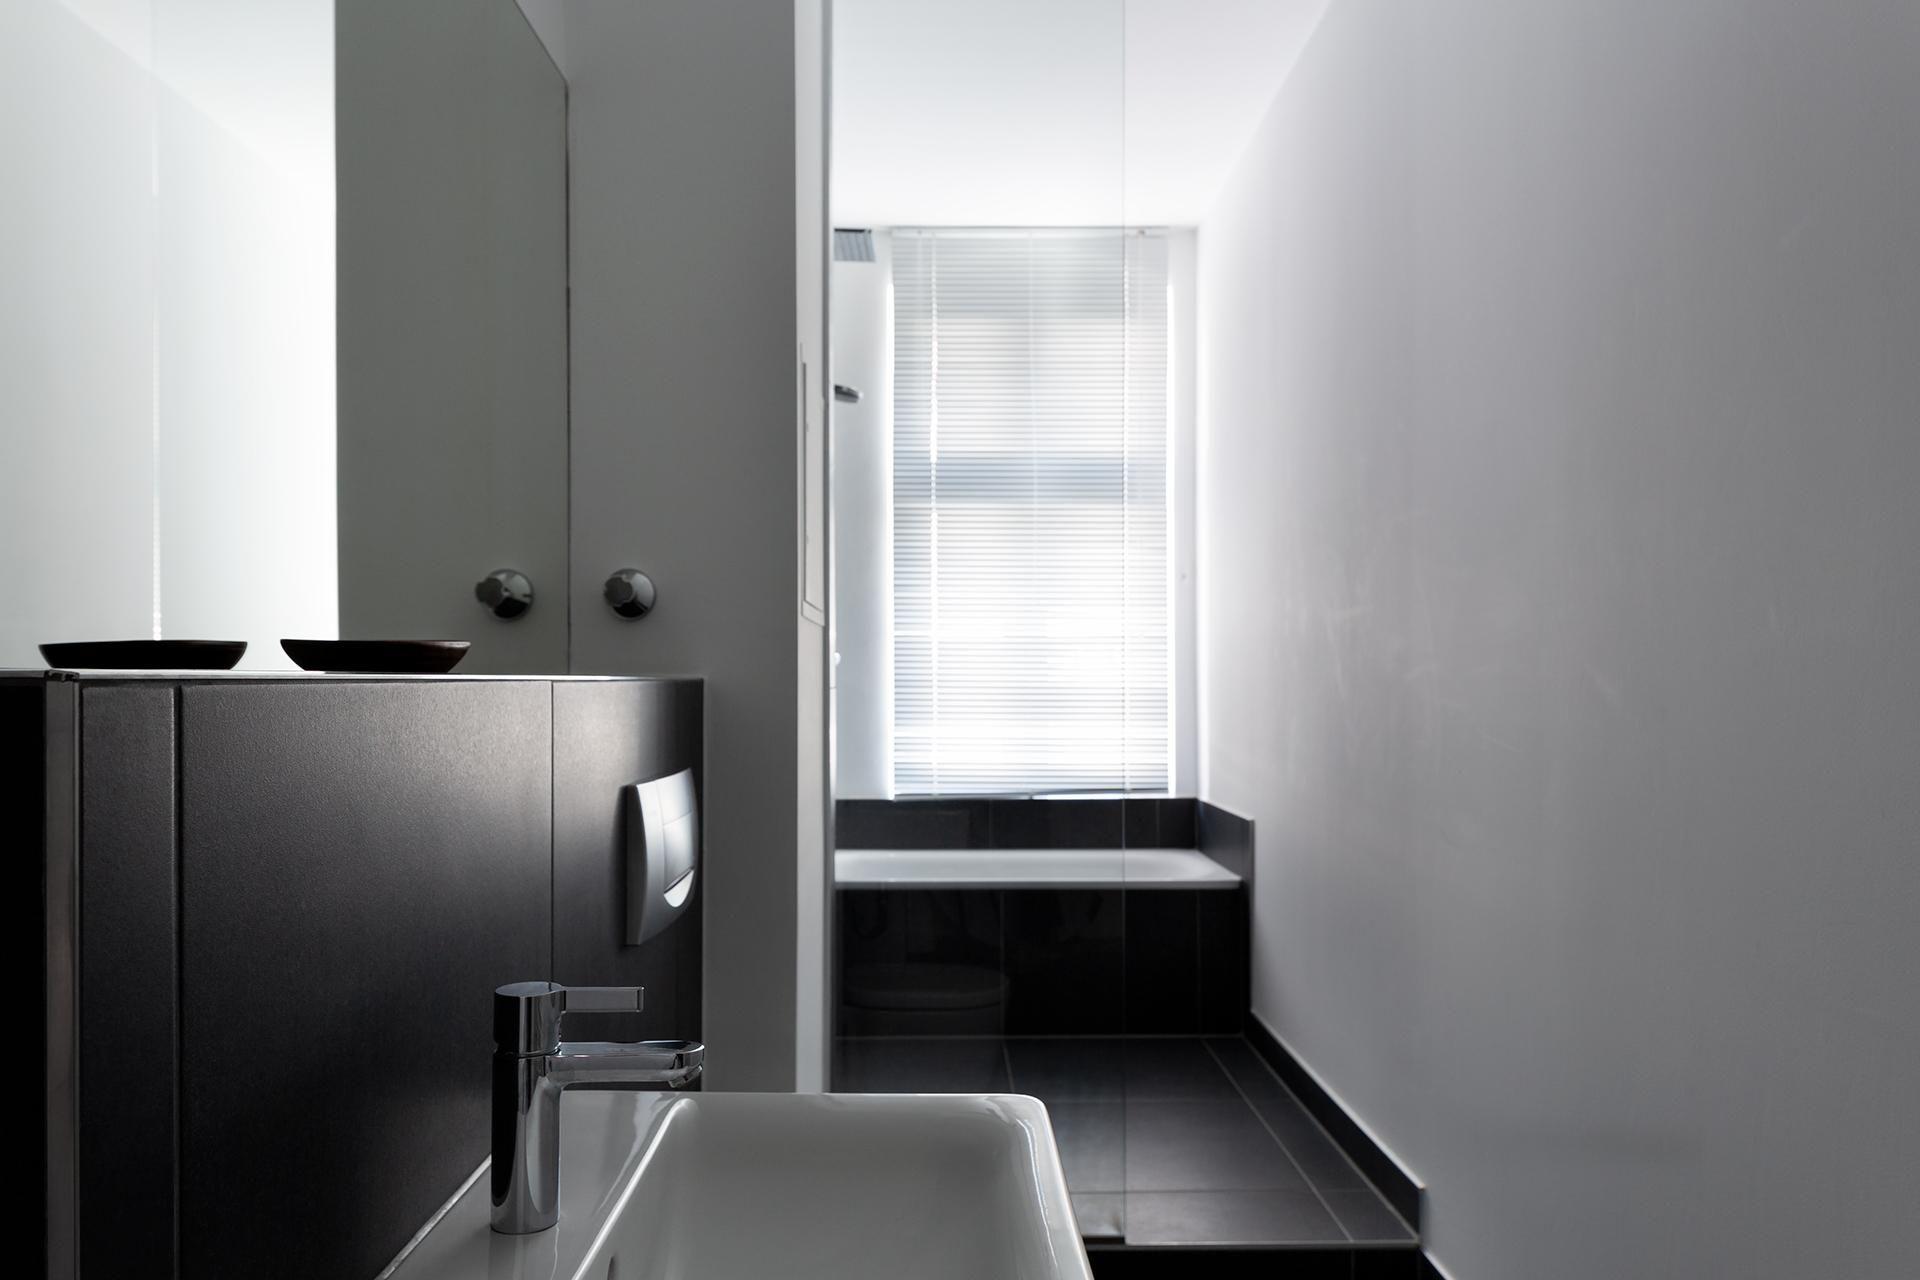 Berlin Bathroom Novalisstrasse 4 Fantastic Frank